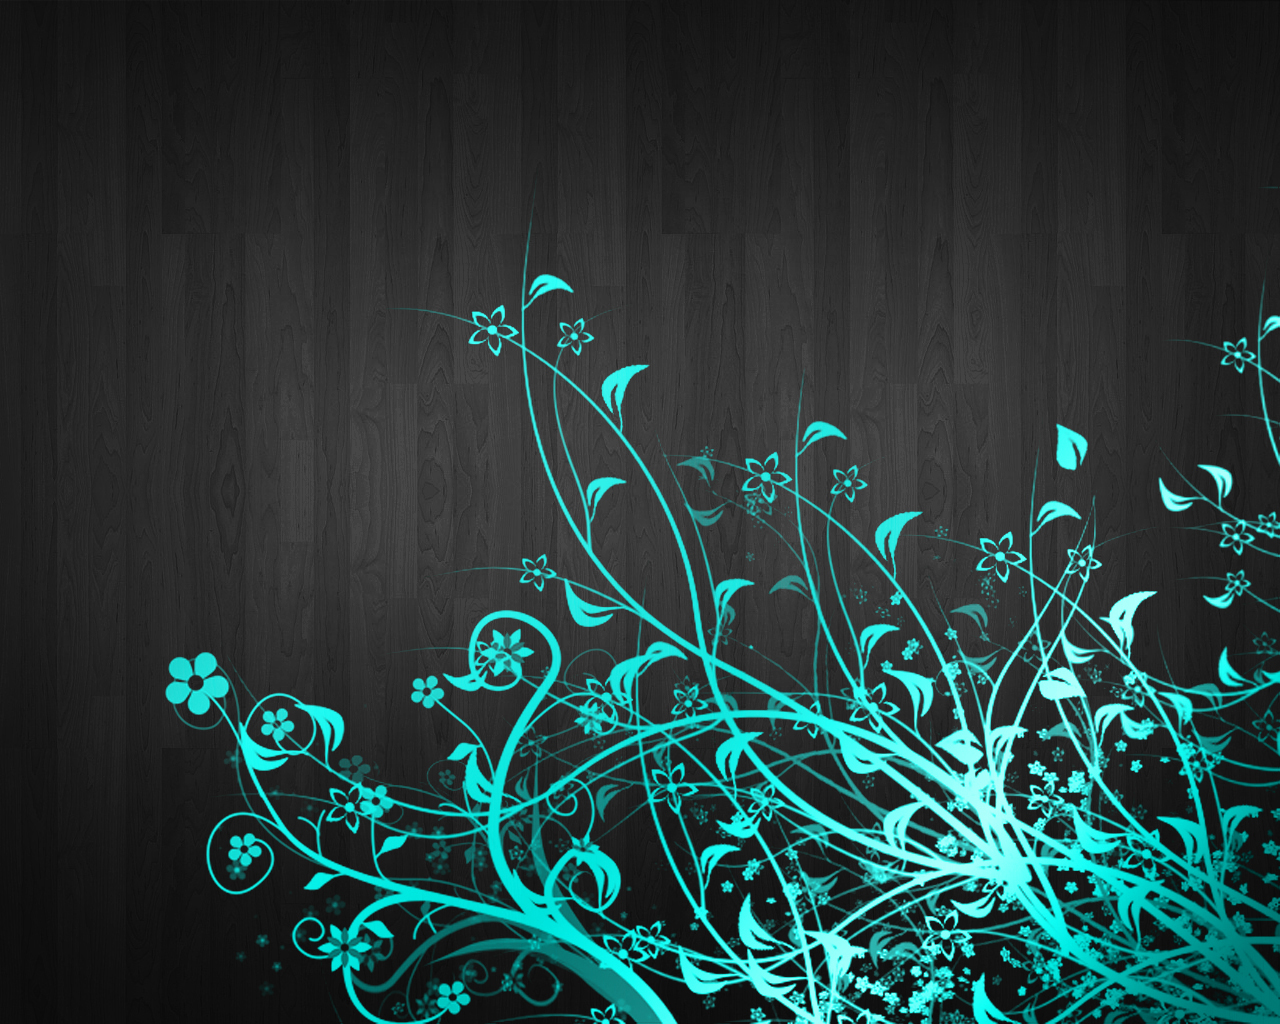 Turquoise Floral Vinyl Wallpaper 1280x1024